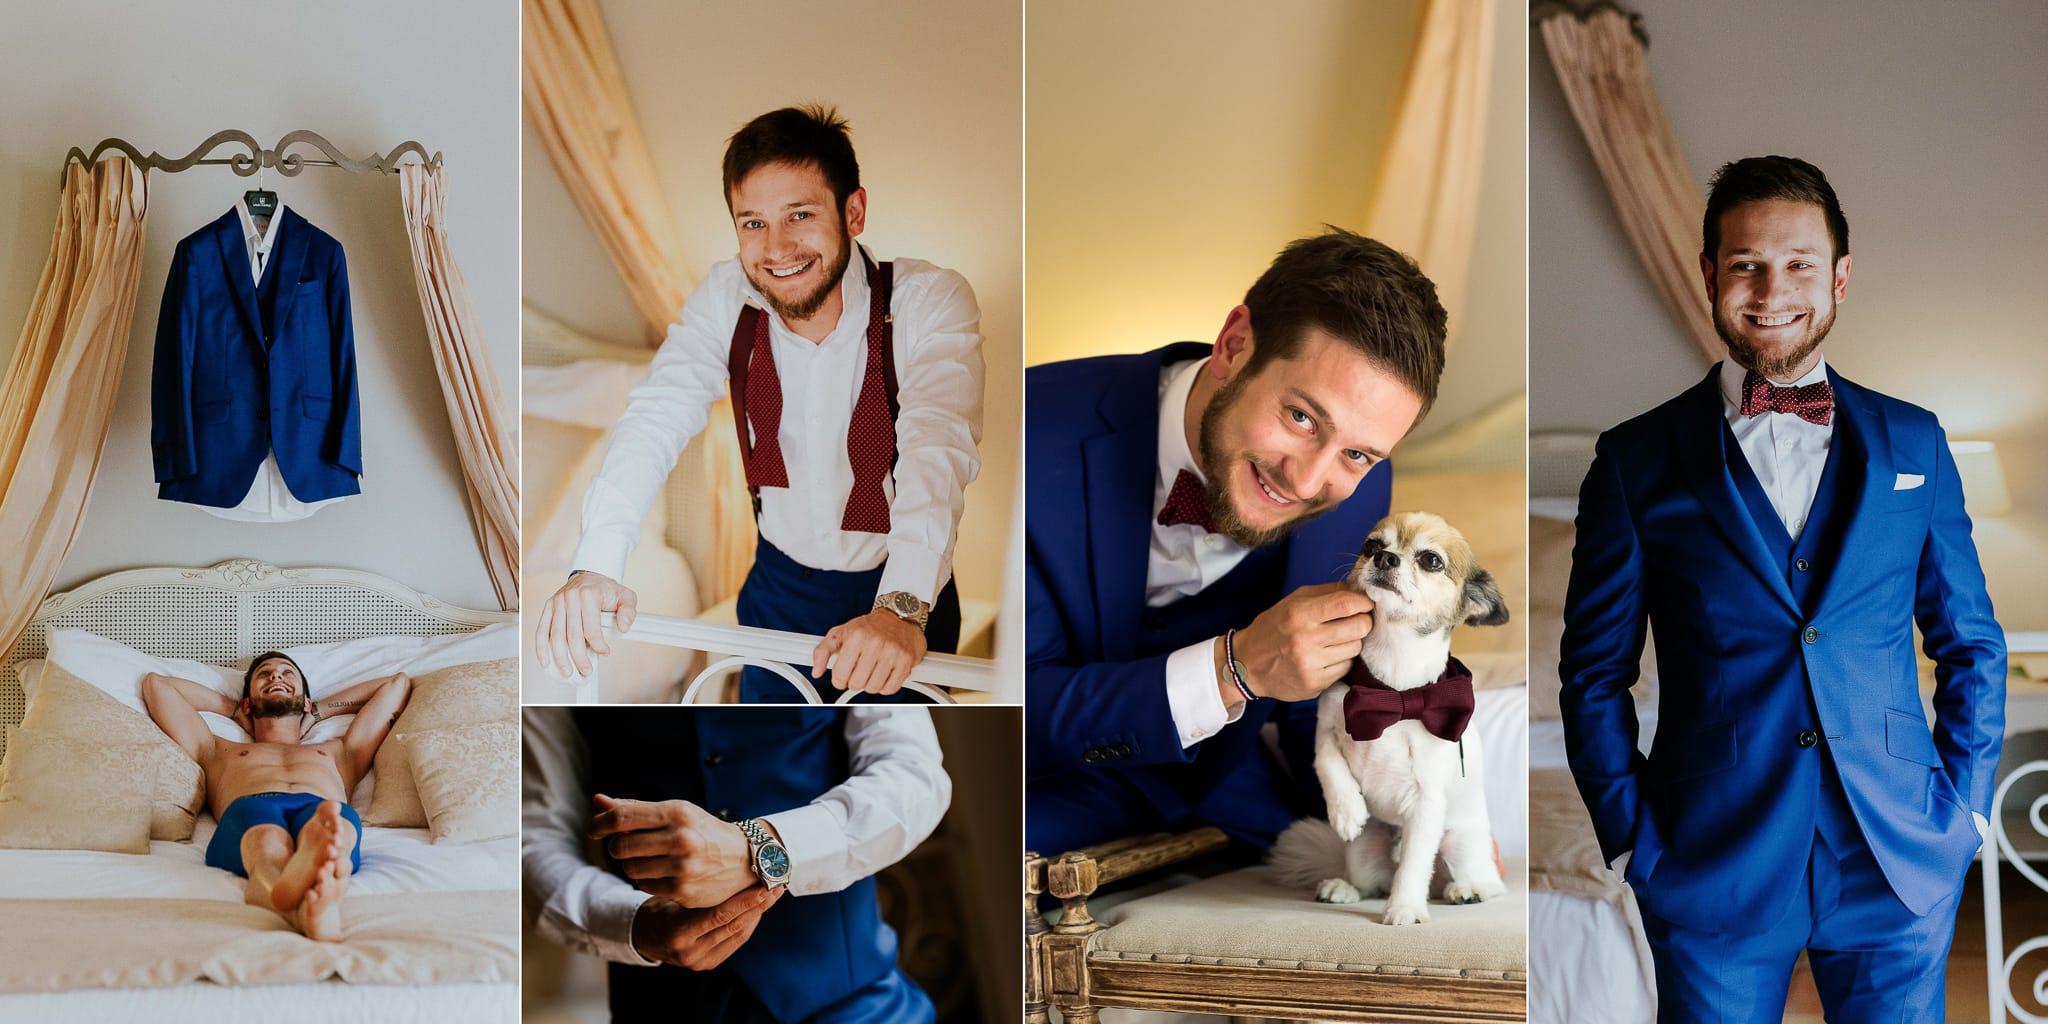 Costi-Moiceanu-Photographer-CM-Photography-Wedding-Mariage-French-Riviera-Cote-D-Azur-Alpes-Maritimes-Weding-Album-Design-8